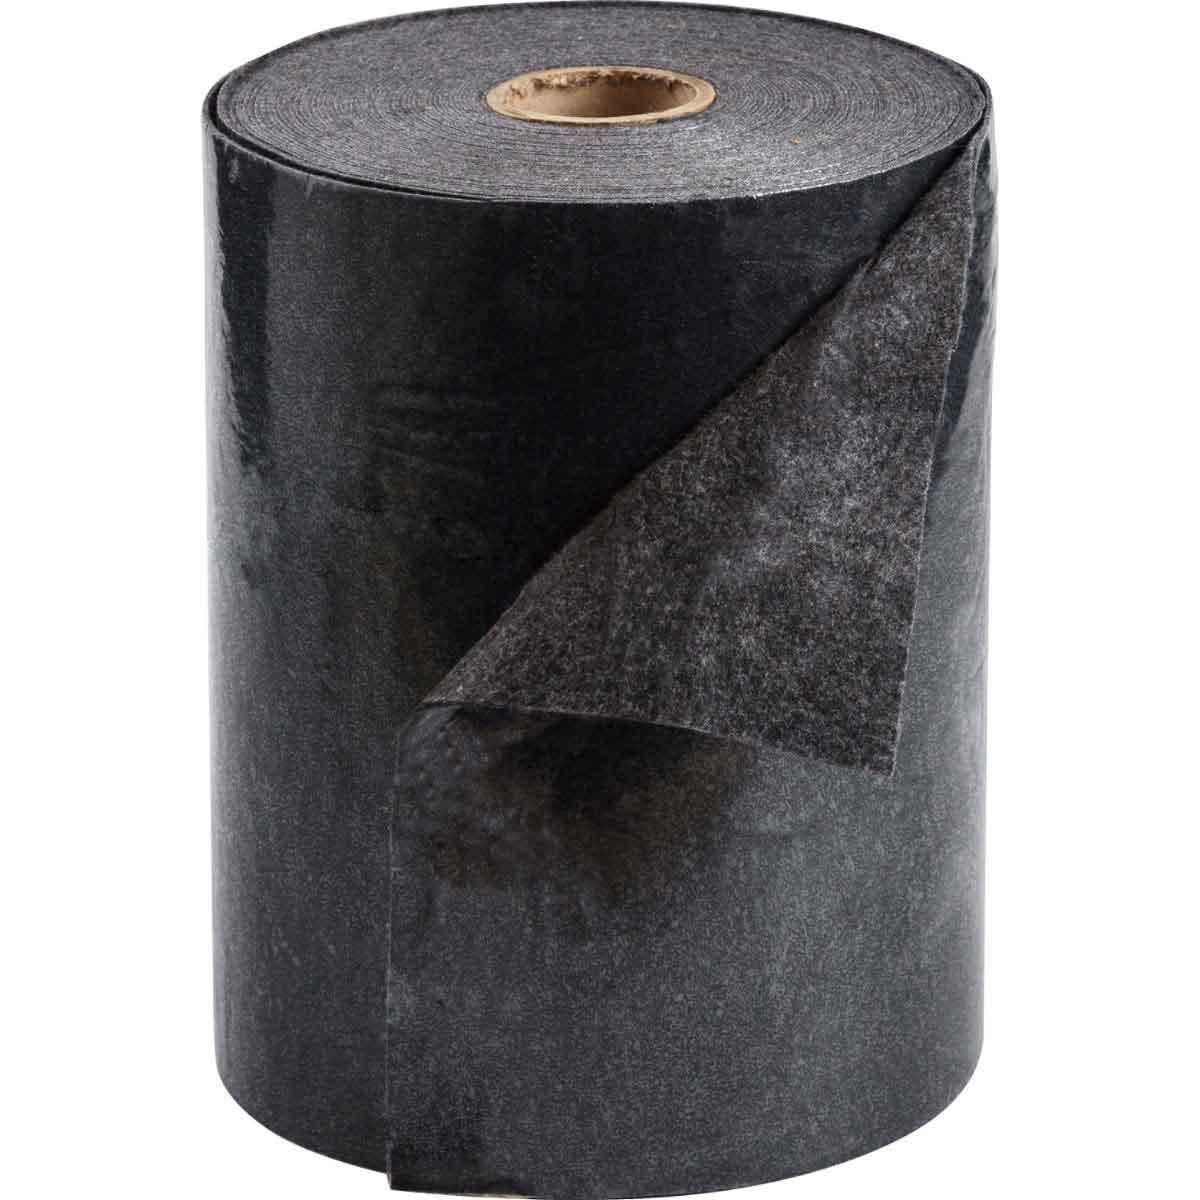 PIG® 2048 Universal Absorbent Sock, 3 in Dia x 48 in L, 95 oz Absorption, Fluids Absorbed: Coolants/Oils/Solvents/Water, Polypropylene Skin/Vermiculite Filler, Blue